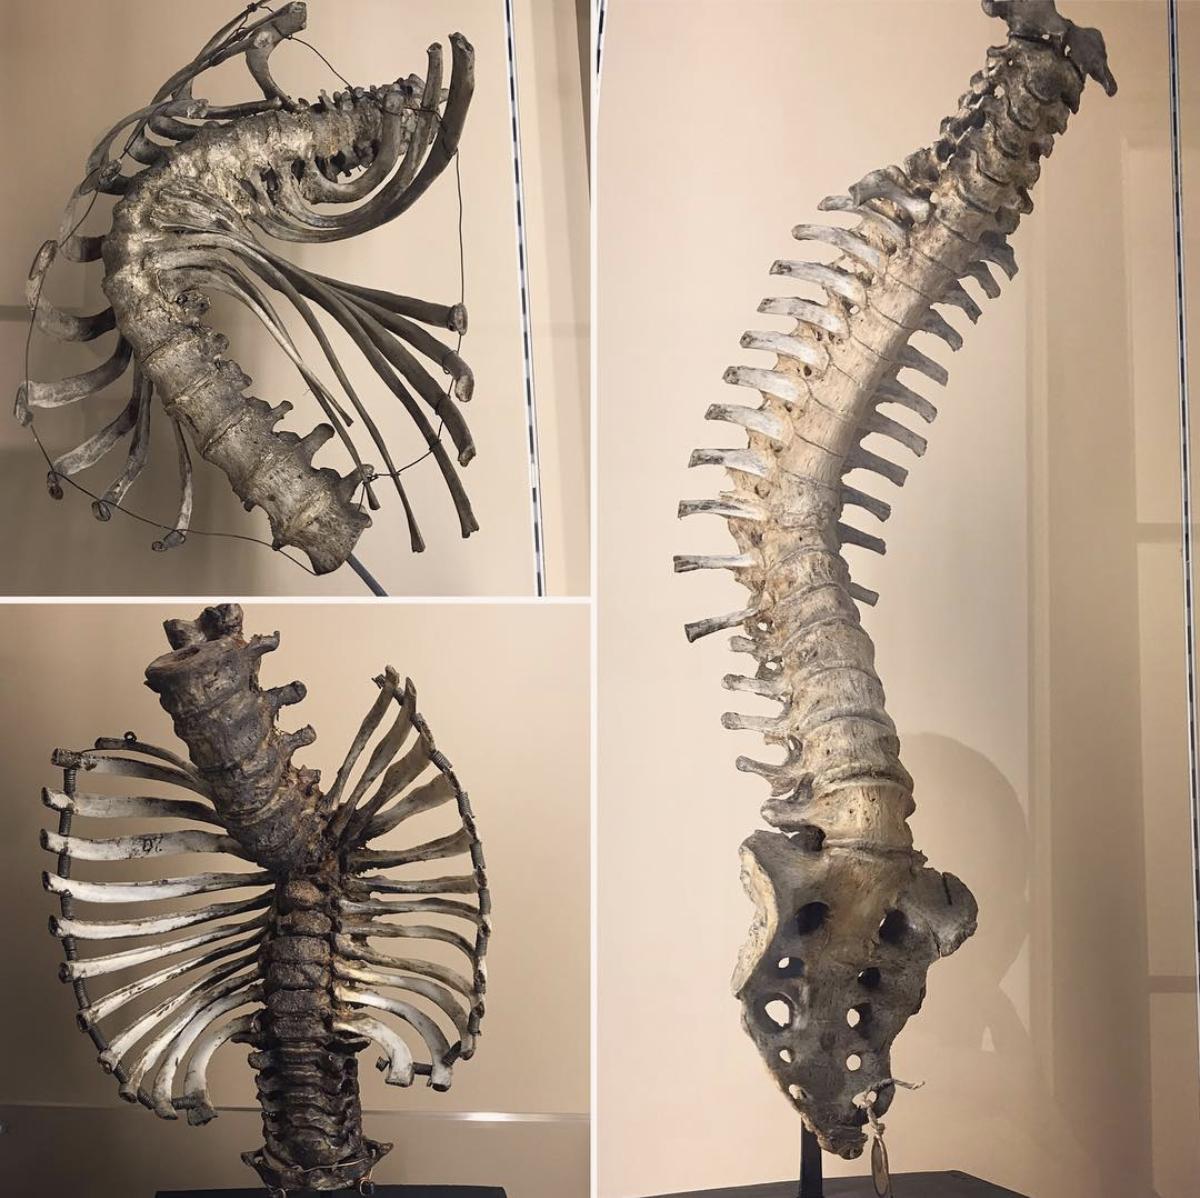 """Seriously f*cked up vertebral columns"""